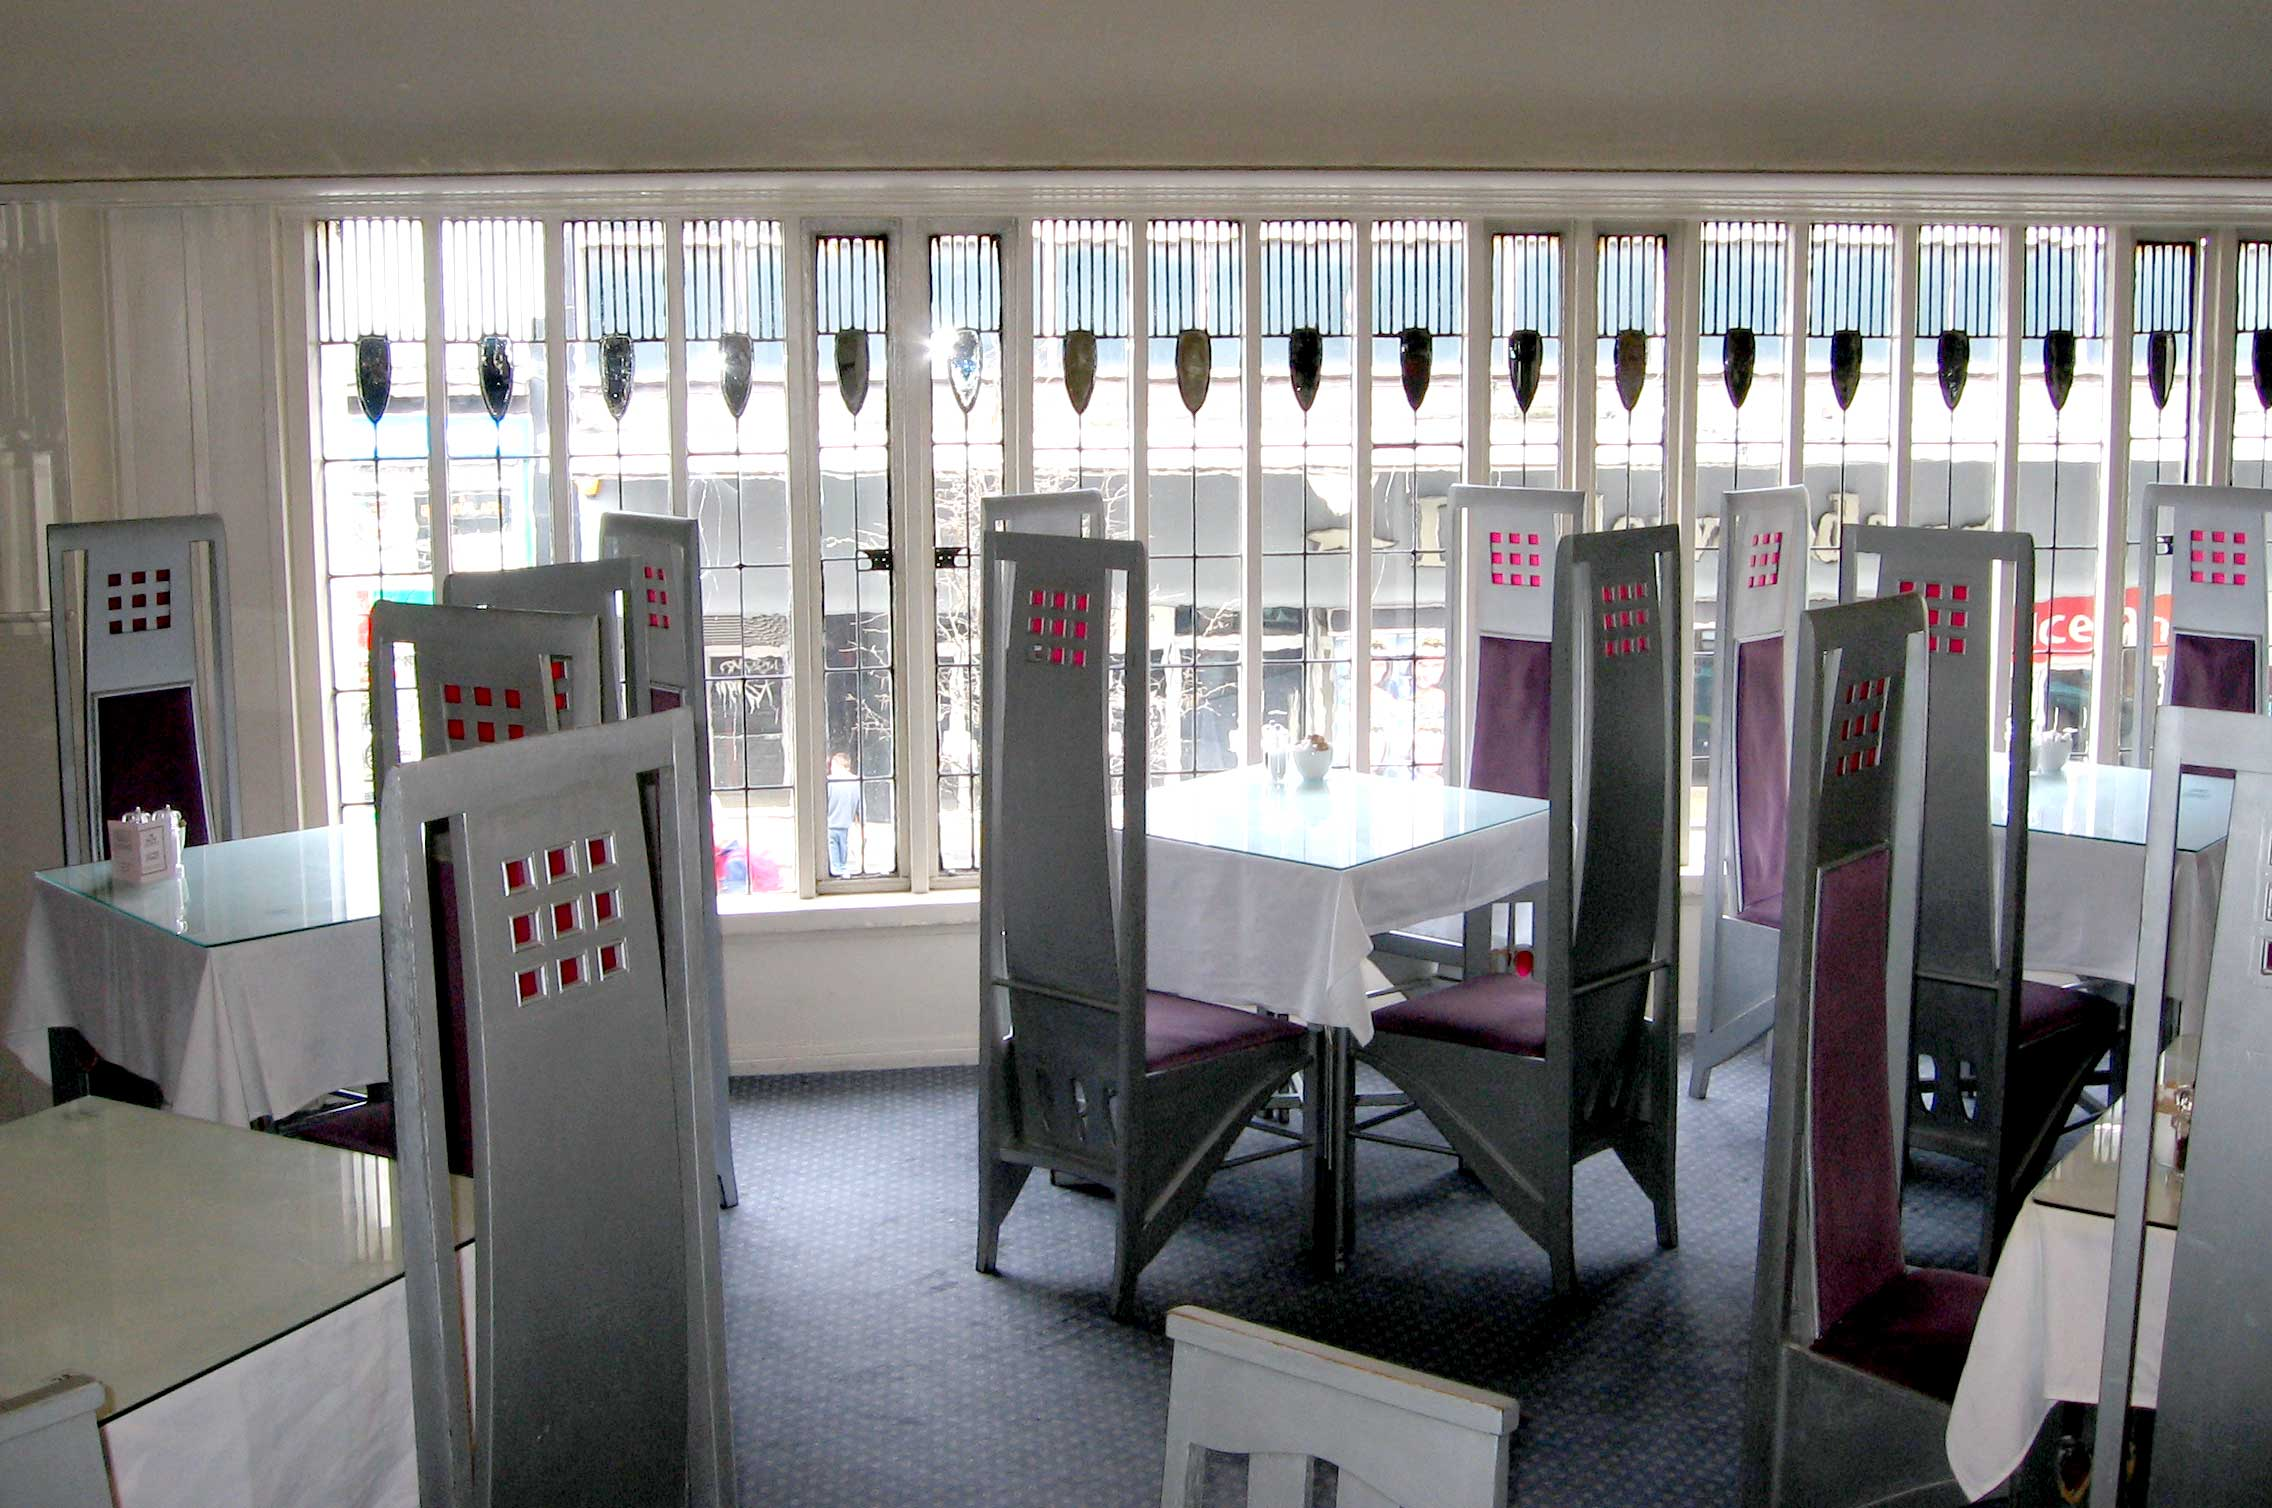 charles rennie mackintosh willow chair throne desk file room de luxe jpg wikipedia